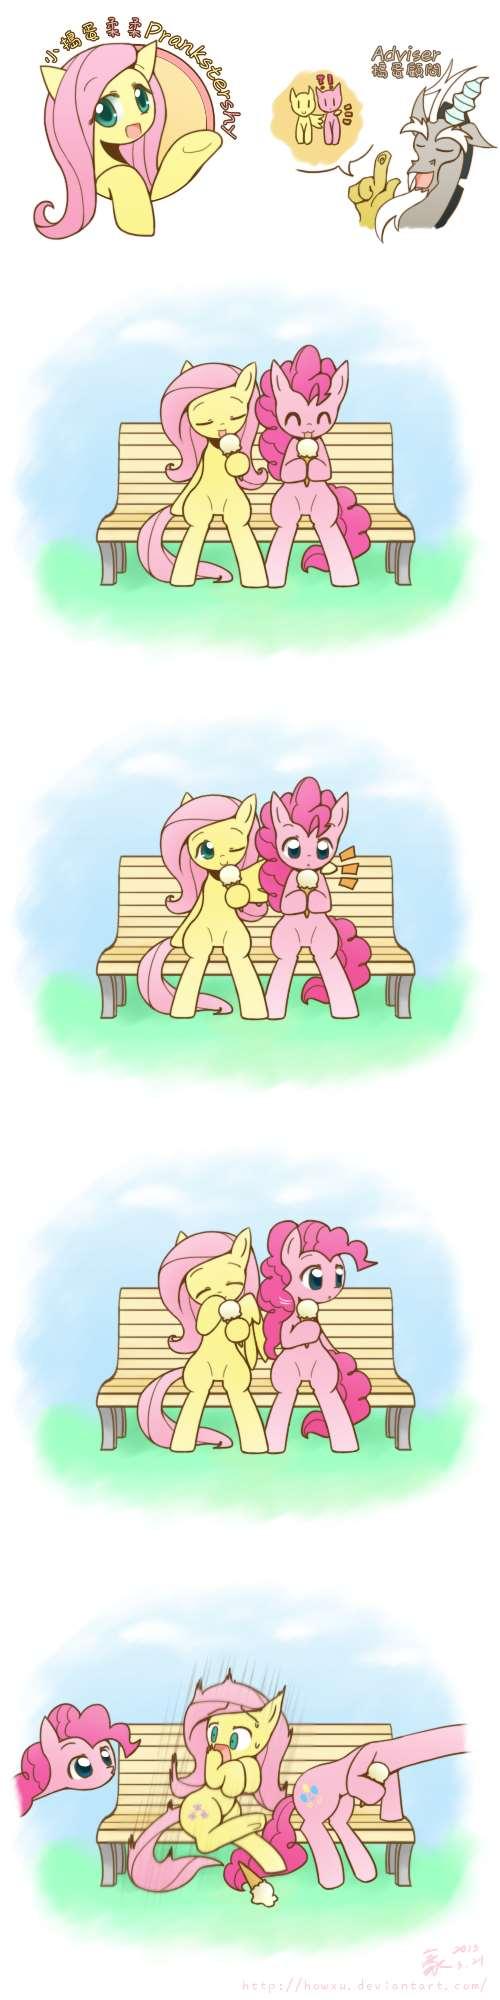 My Little Pony Friendship is Magic 3090